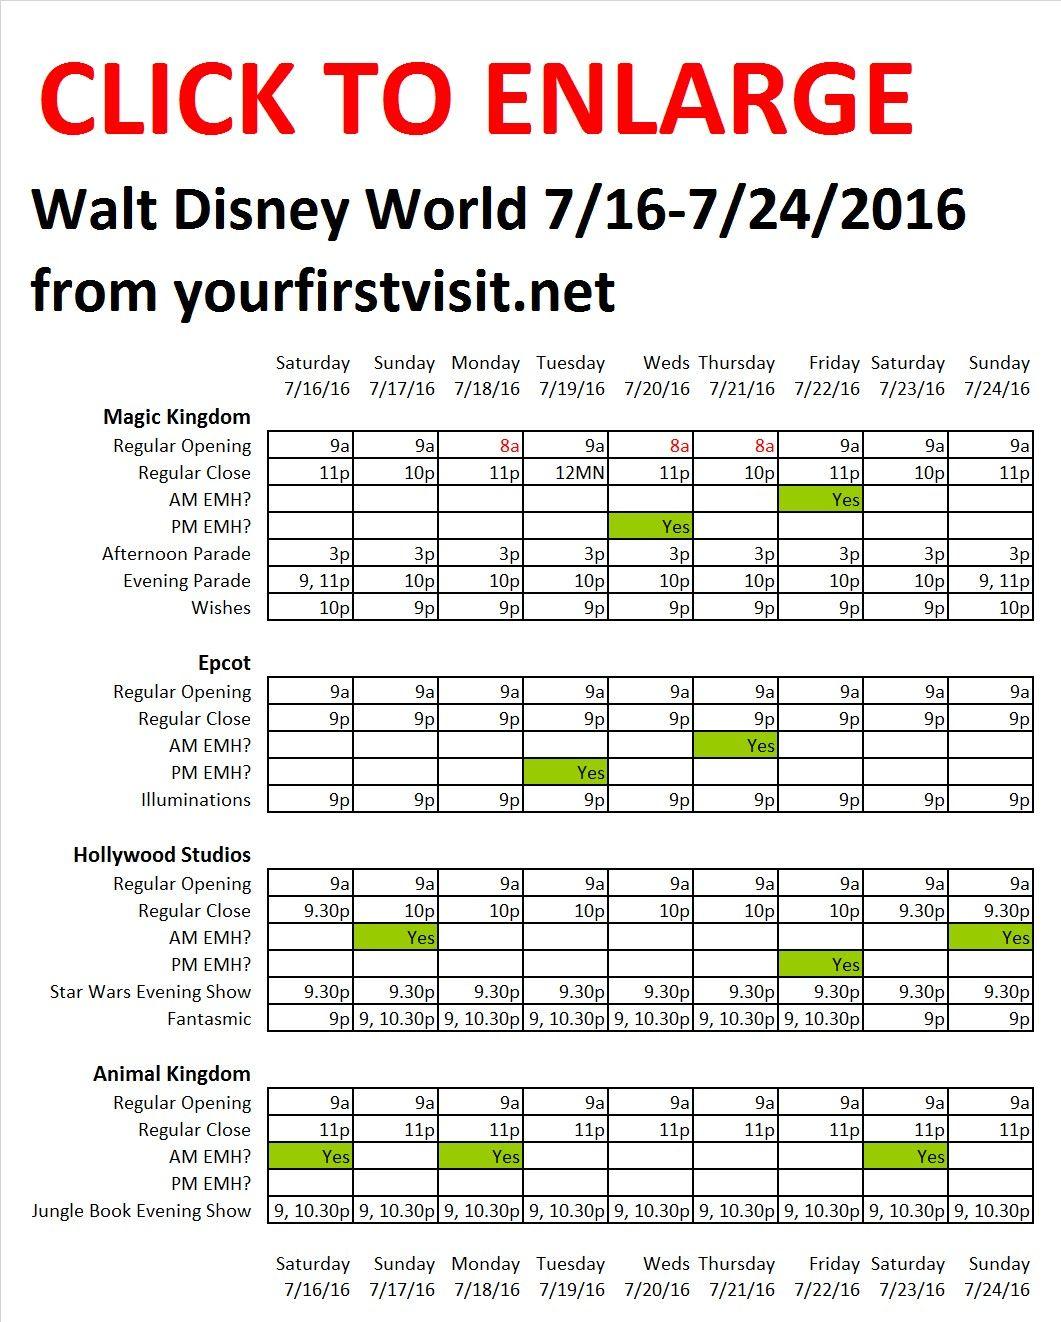 Next Week July 16 Through July 24 2016 At Walt Disney World Disney World